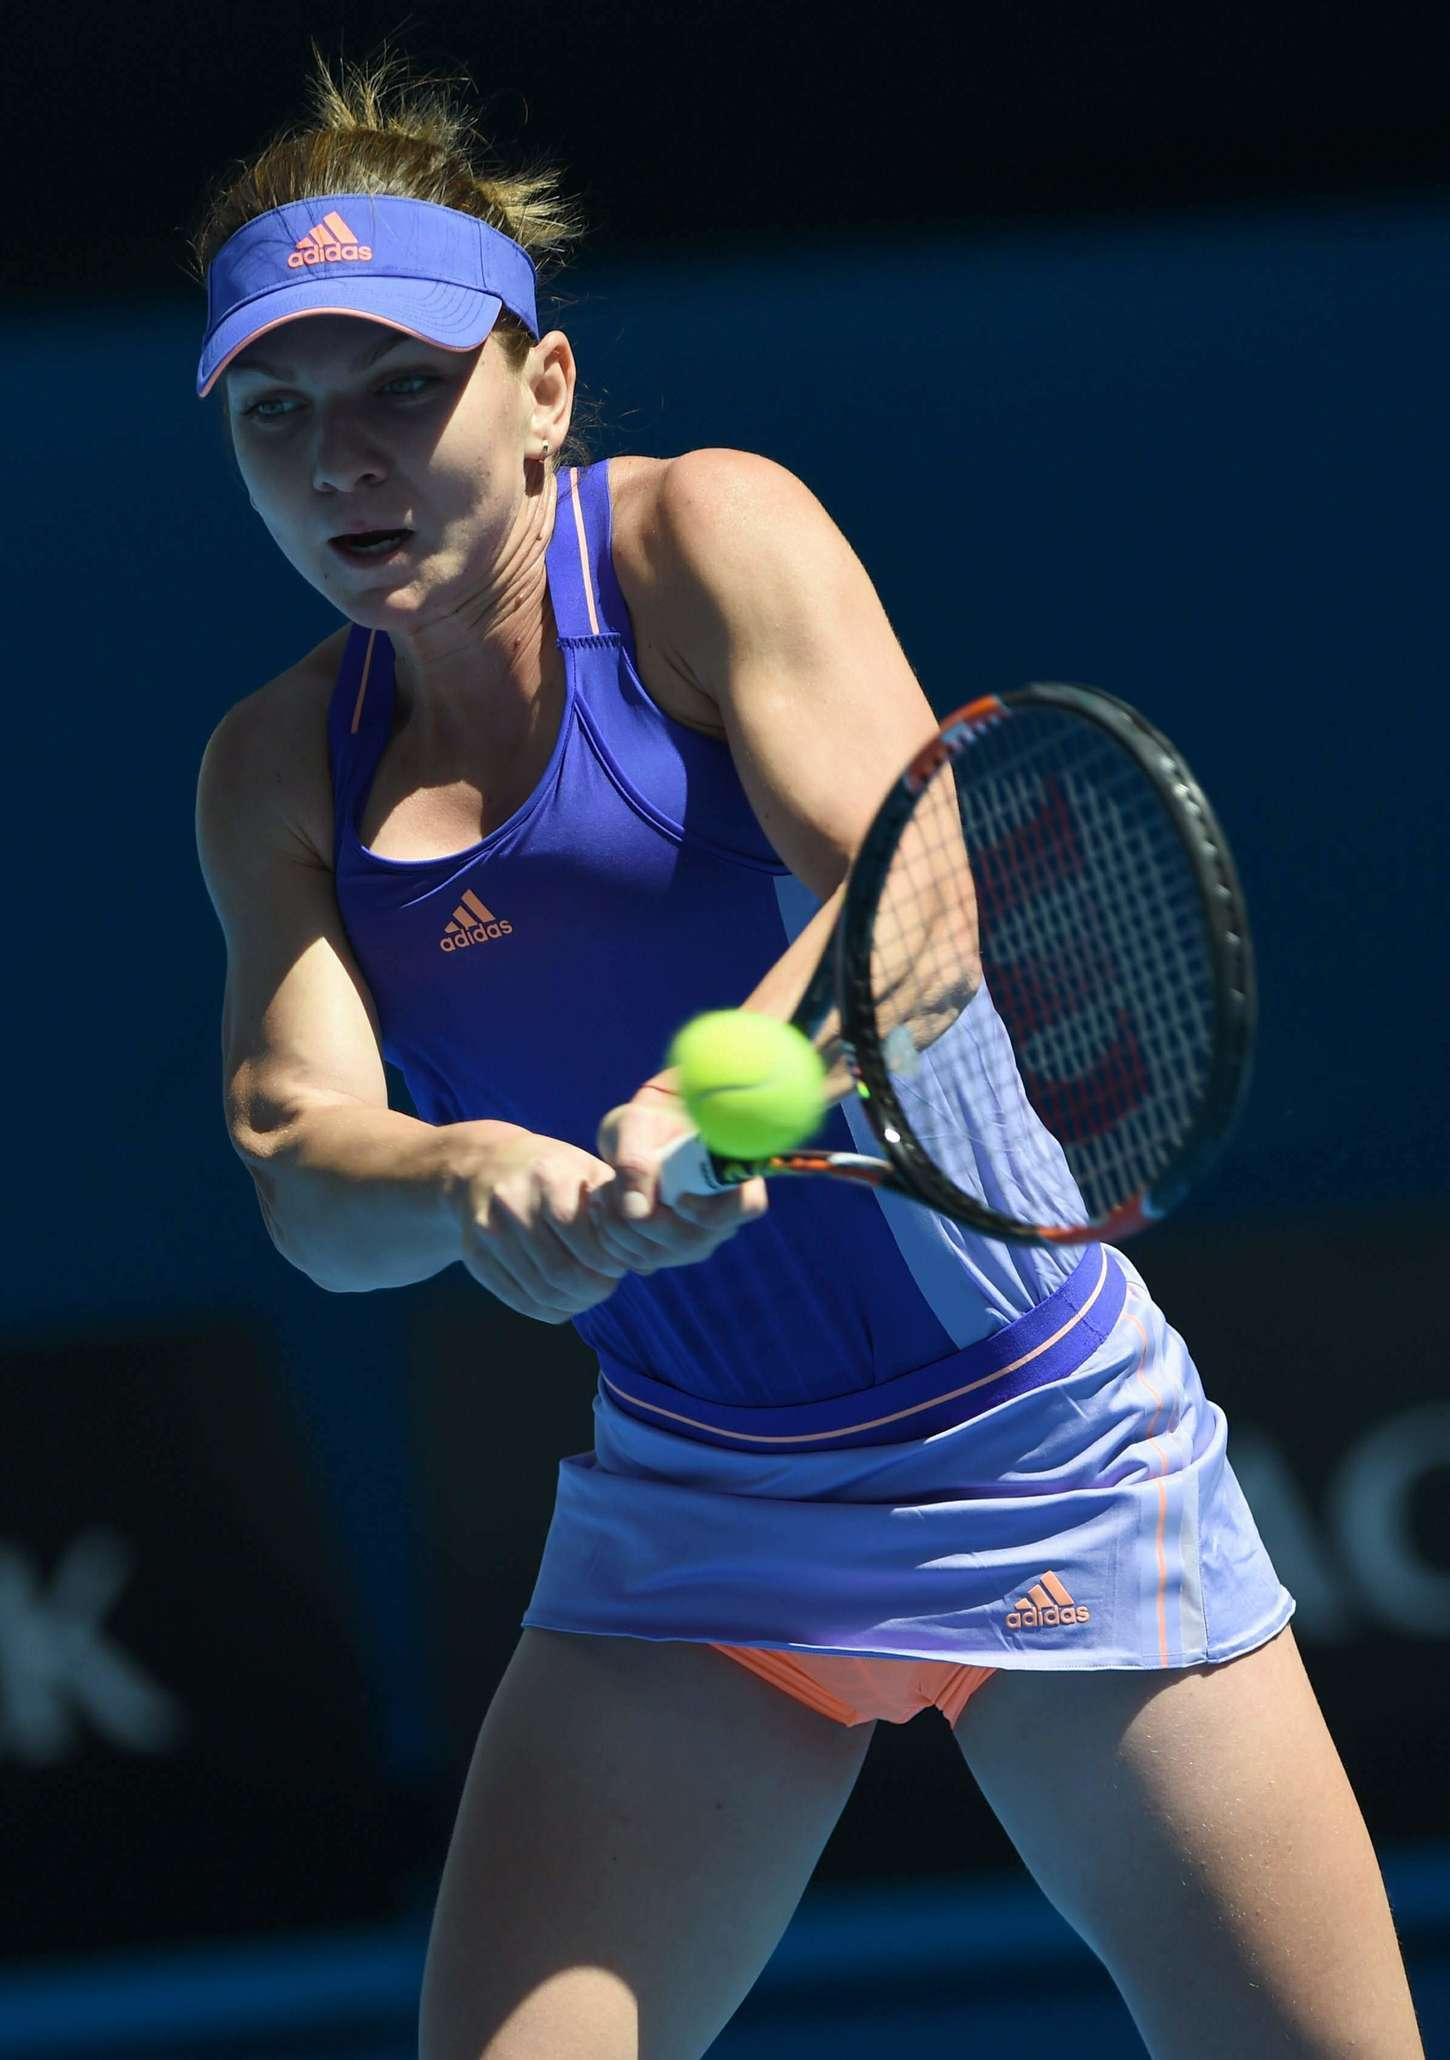 Simona Halep Australian Open in Melbourne